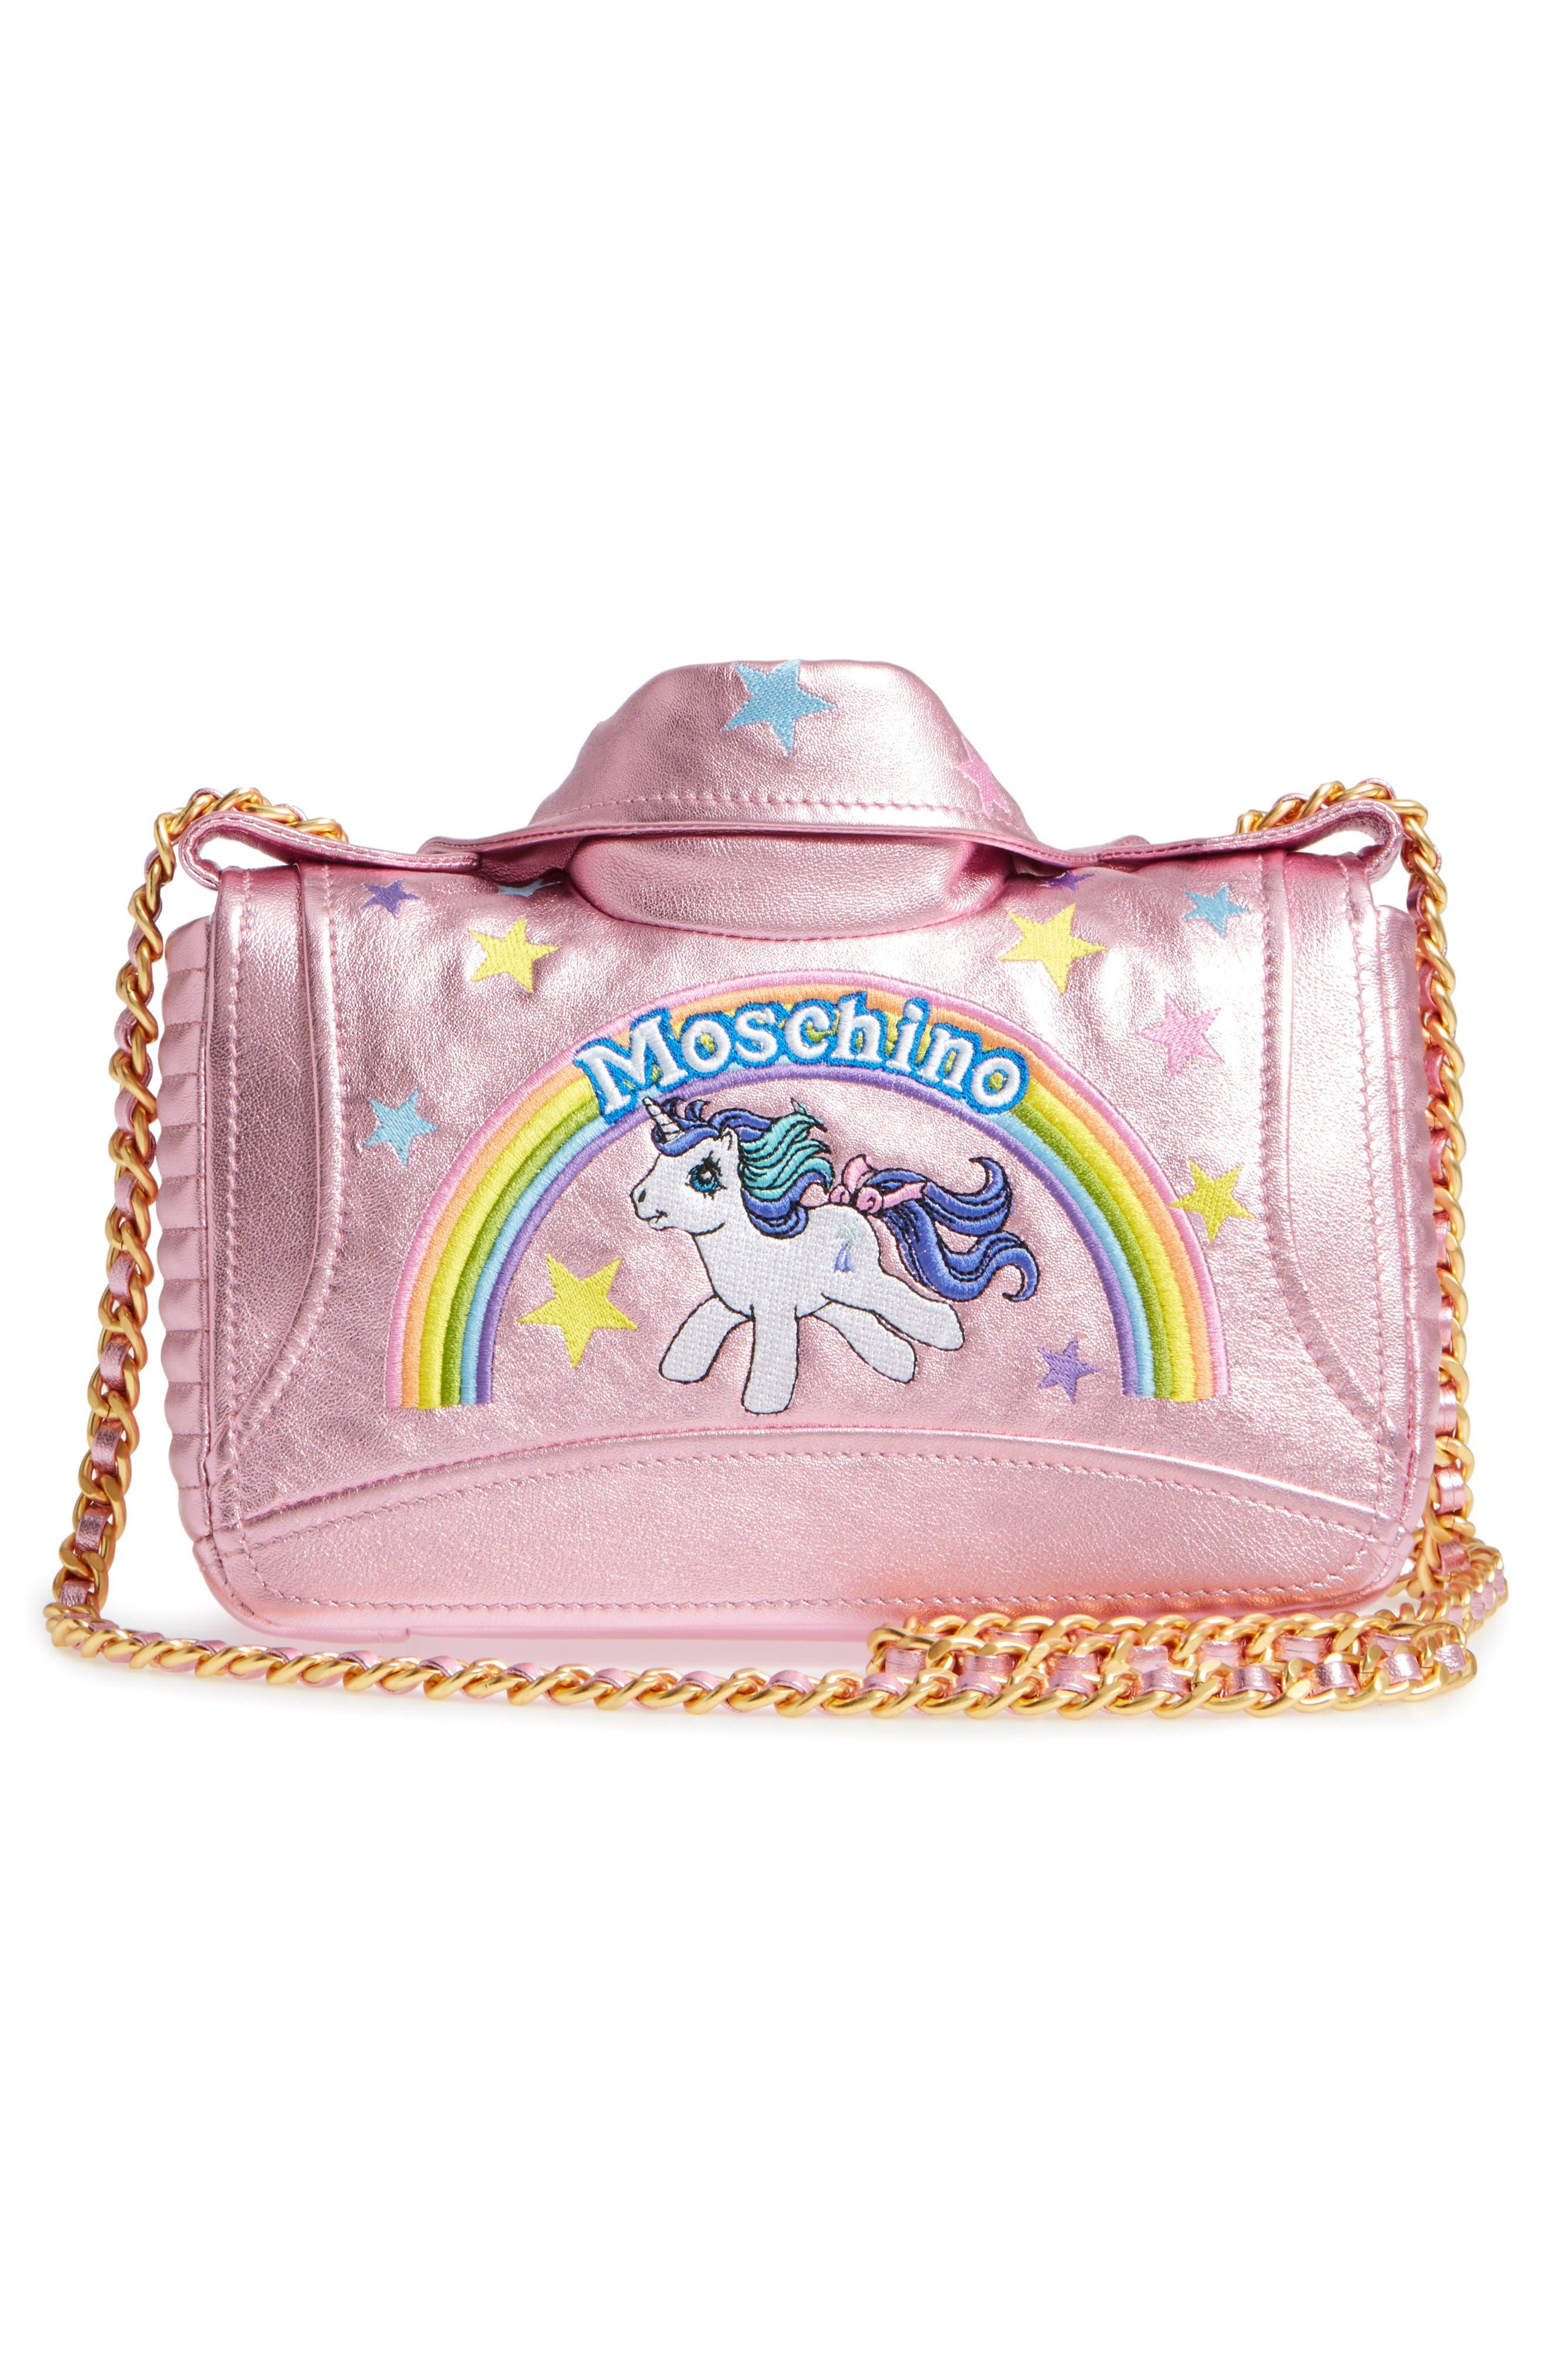 x My Little Pony Biker Jacket Metallic Leather Crossbody Bag,                             Alternate thumbnail 3, color,                             Pink